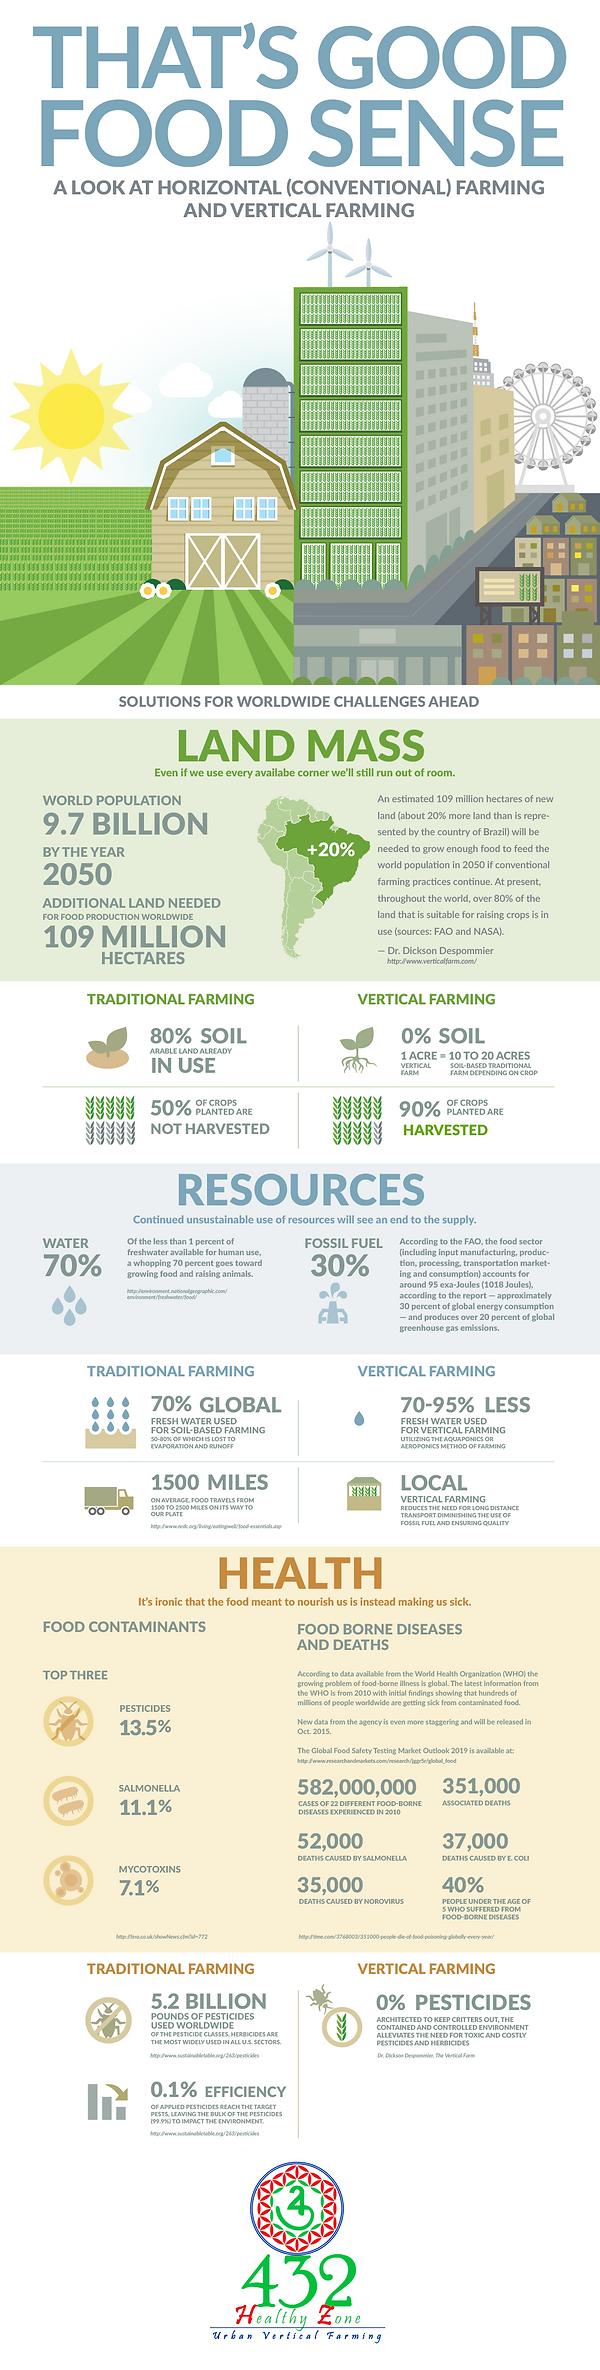 Traditional farming vs Vertical farming